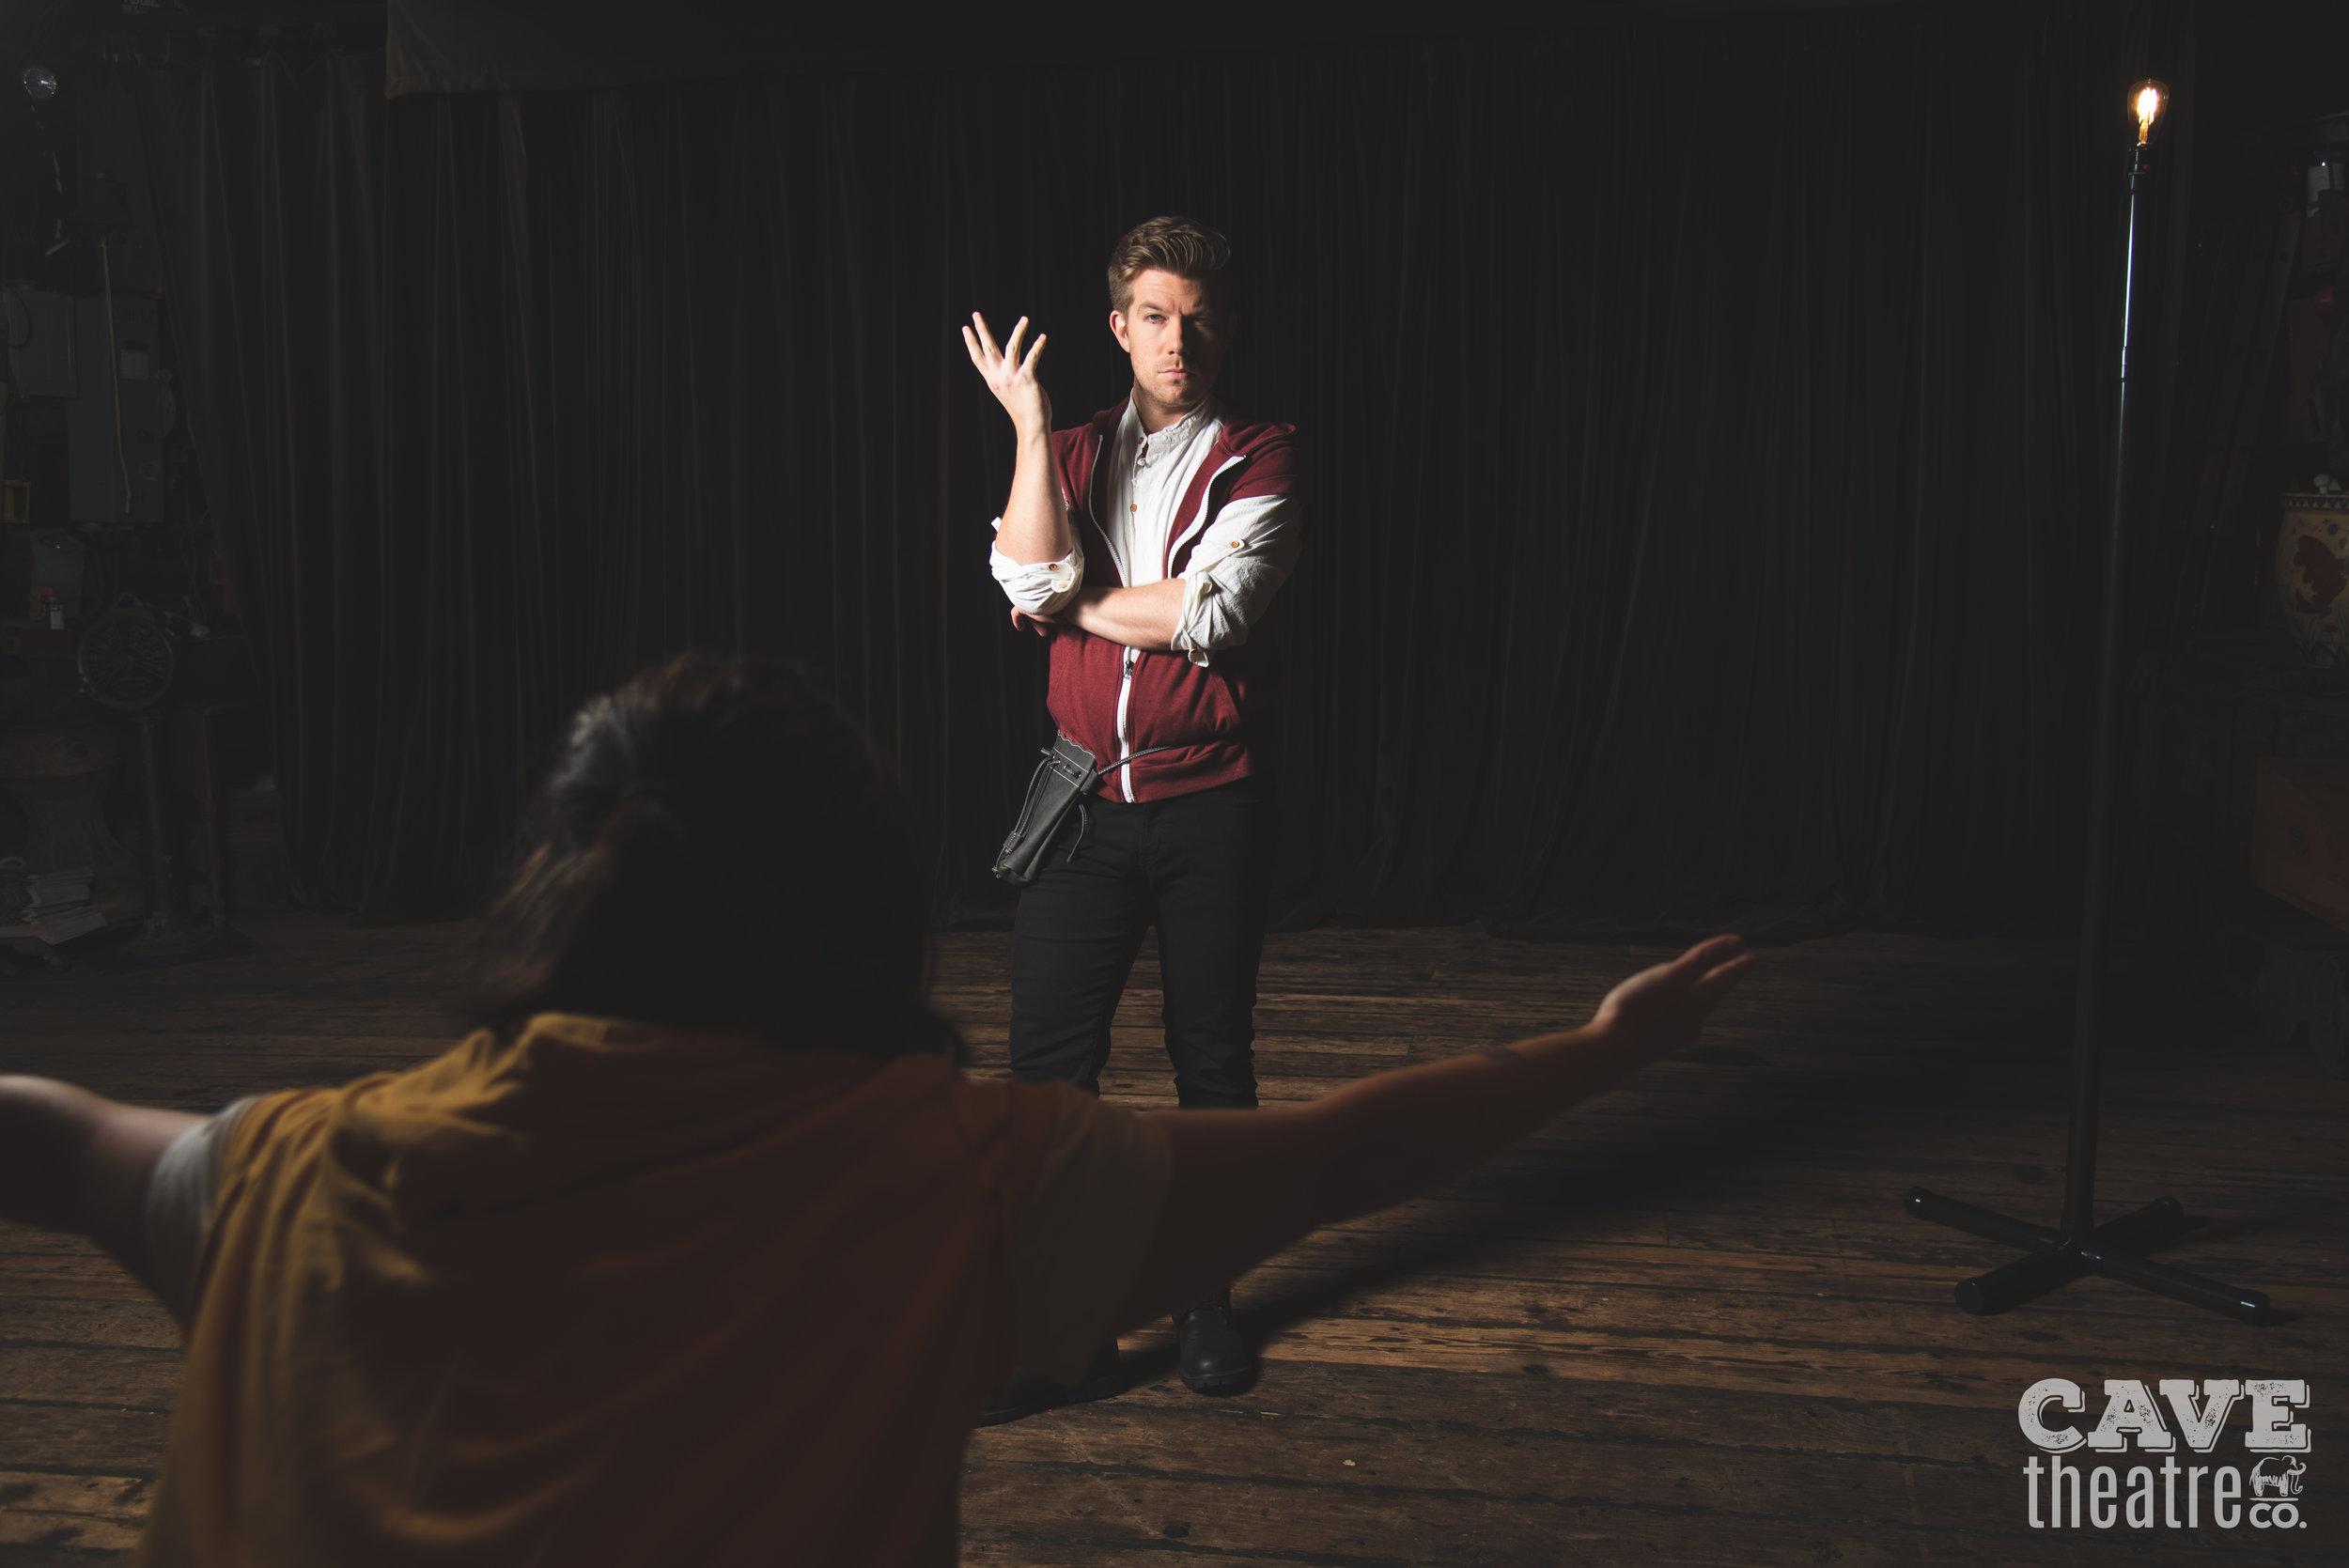 Cave Theatre Co. - 10.19.2018 - DSC_1154.jpg